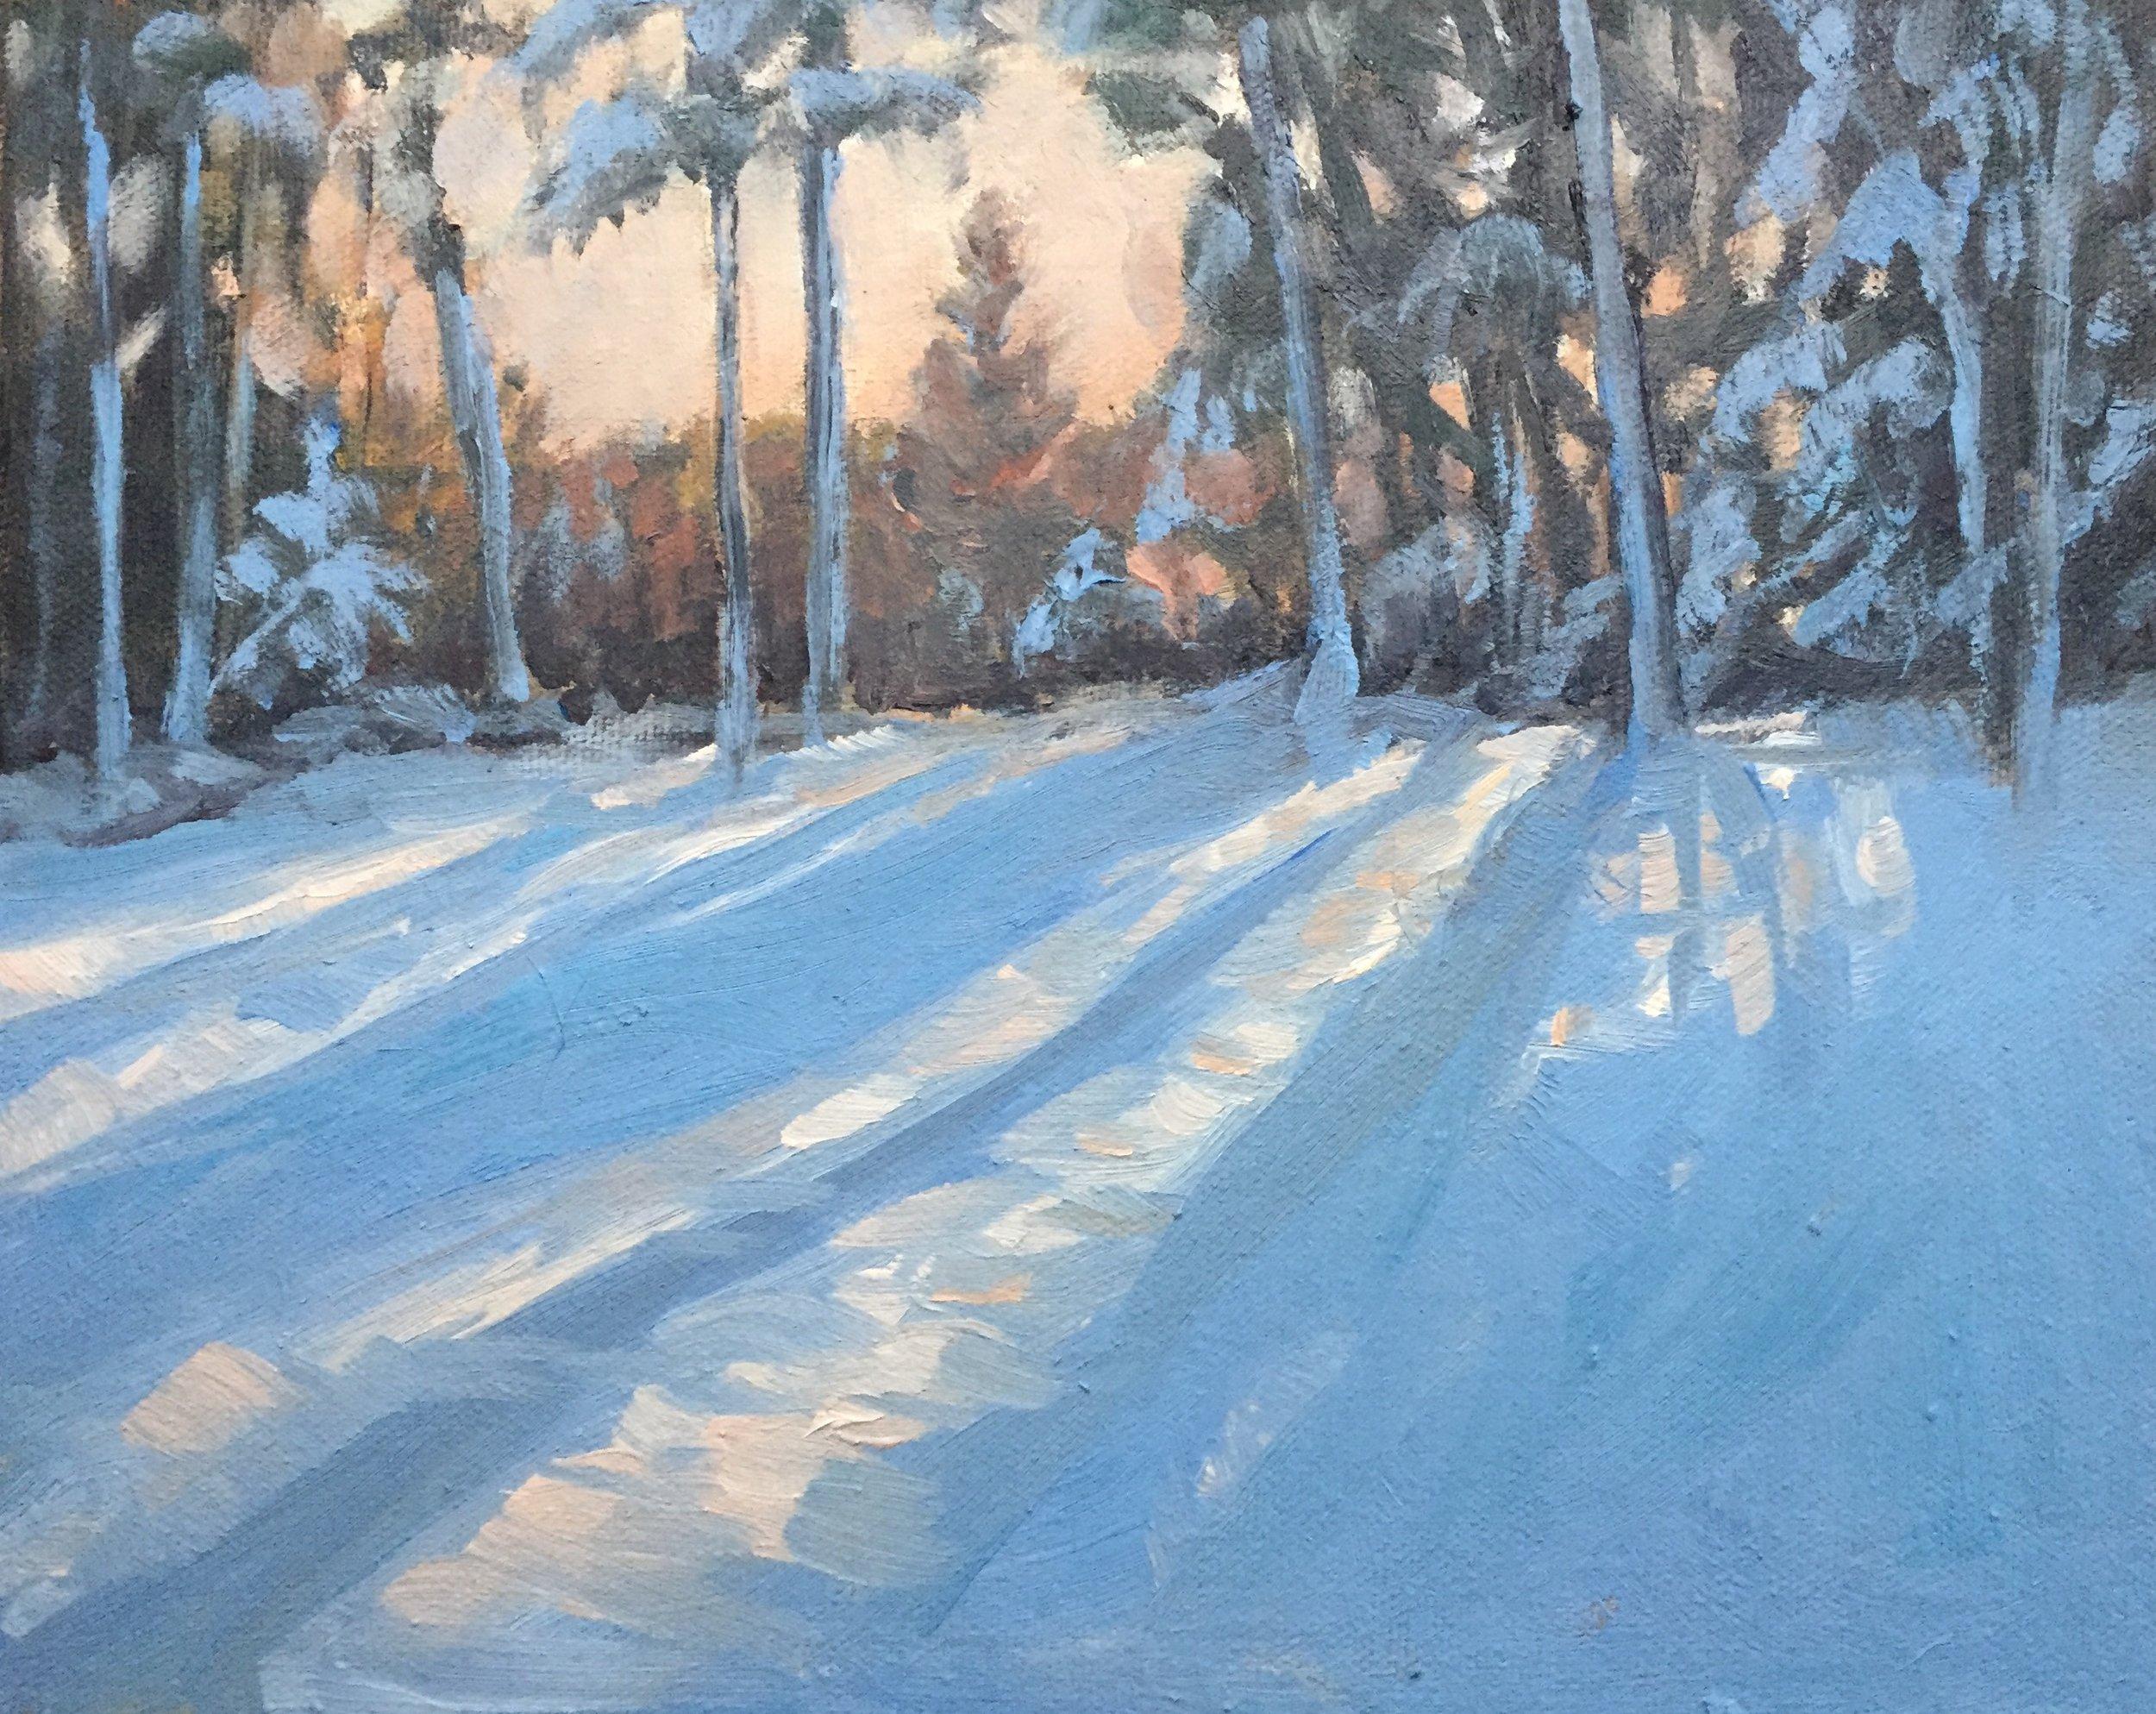 Sun Setting on Fresh Snow